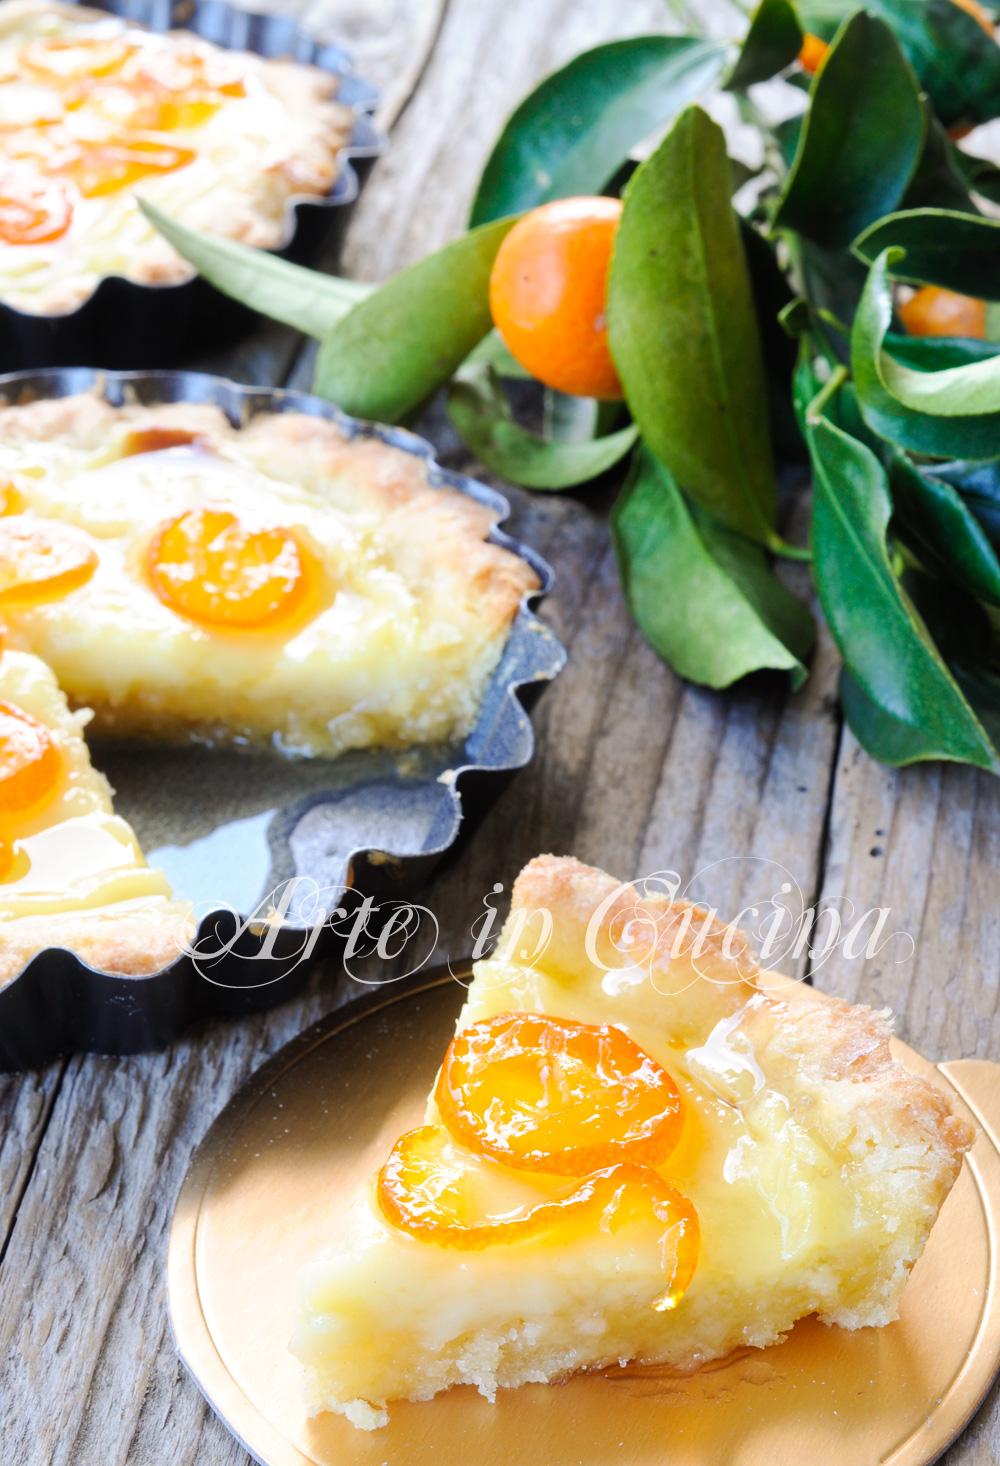 Crostatine crema e kumquat caramellati ricetta facile vickyart arte in cucina